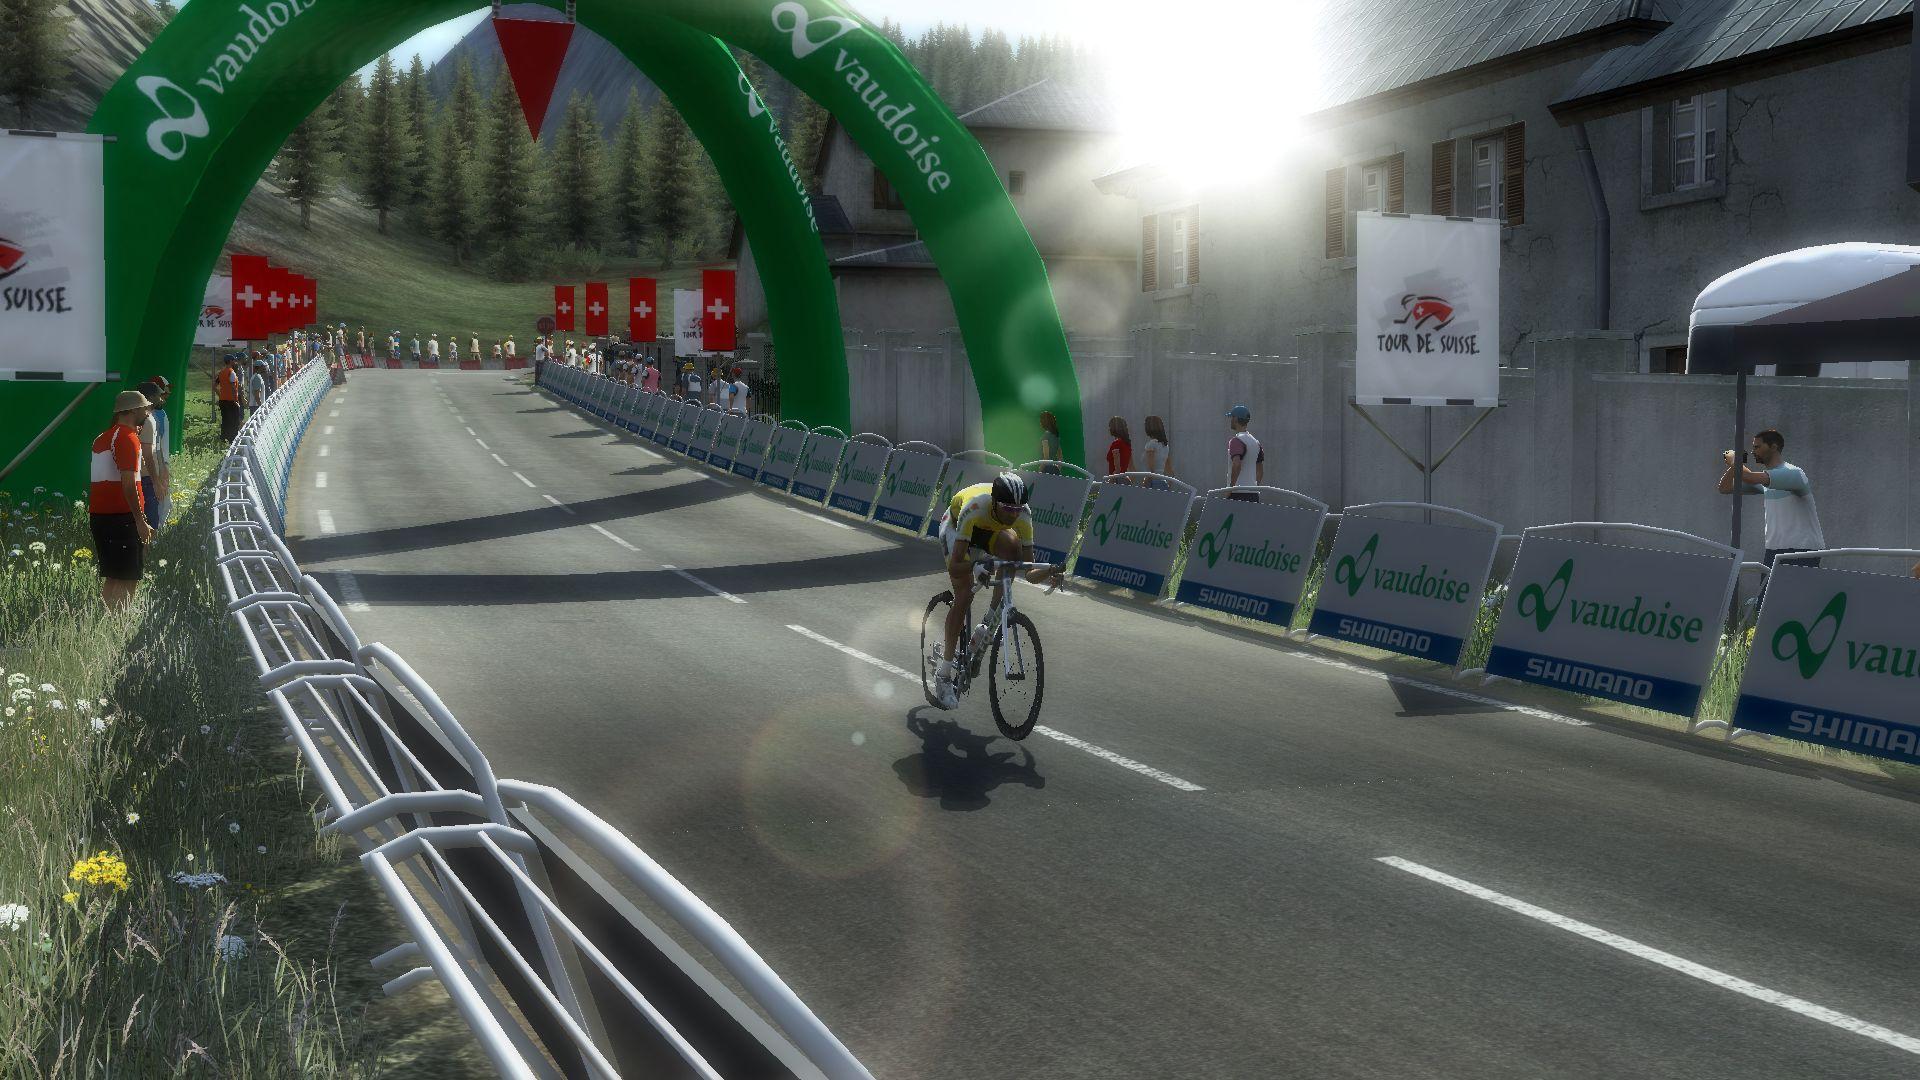 pcmdaily.com/images/mg/2017/Races/U23/Avenir/AVES7%2027.jpg